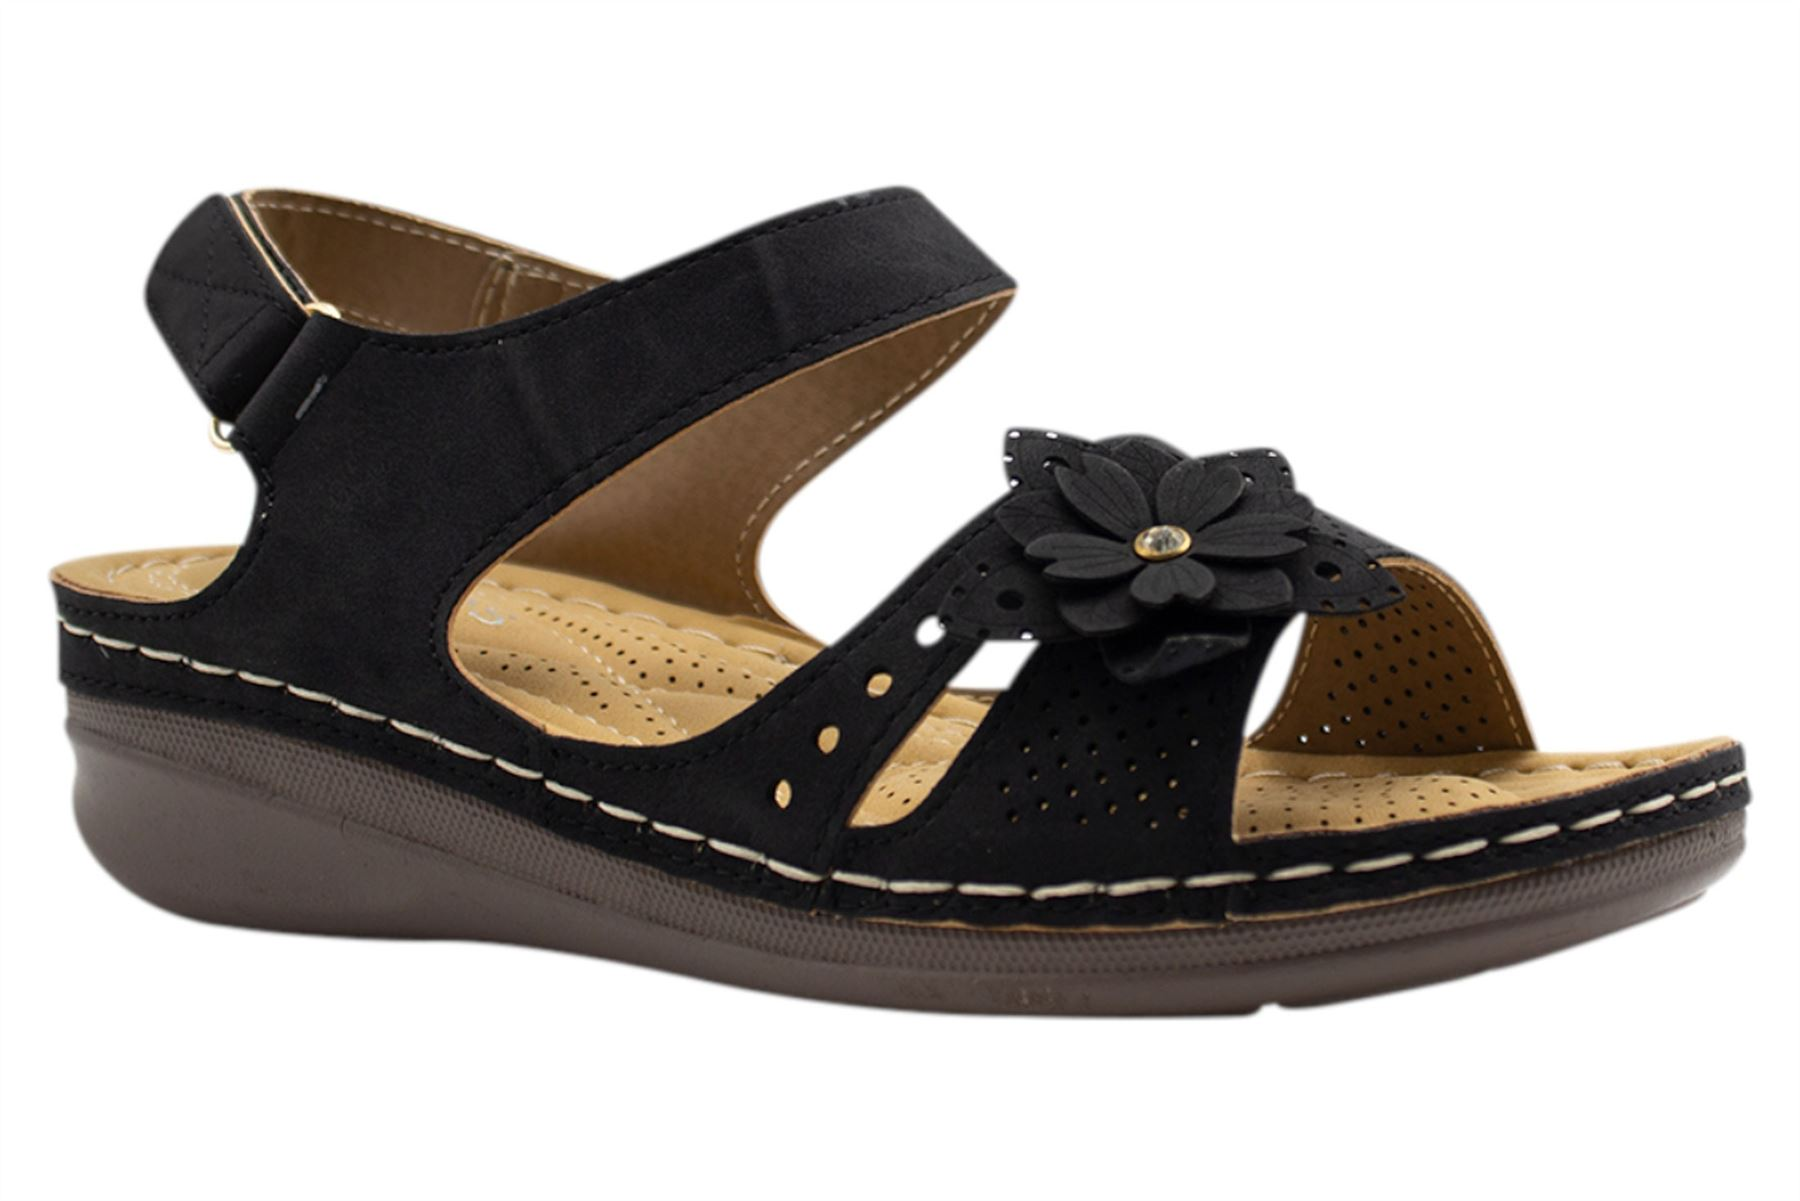 Ladies-Wedge-Heel-Sandal-Womens-Comfort-Cushion-Strapy-Summer-Shoes miniatura 20